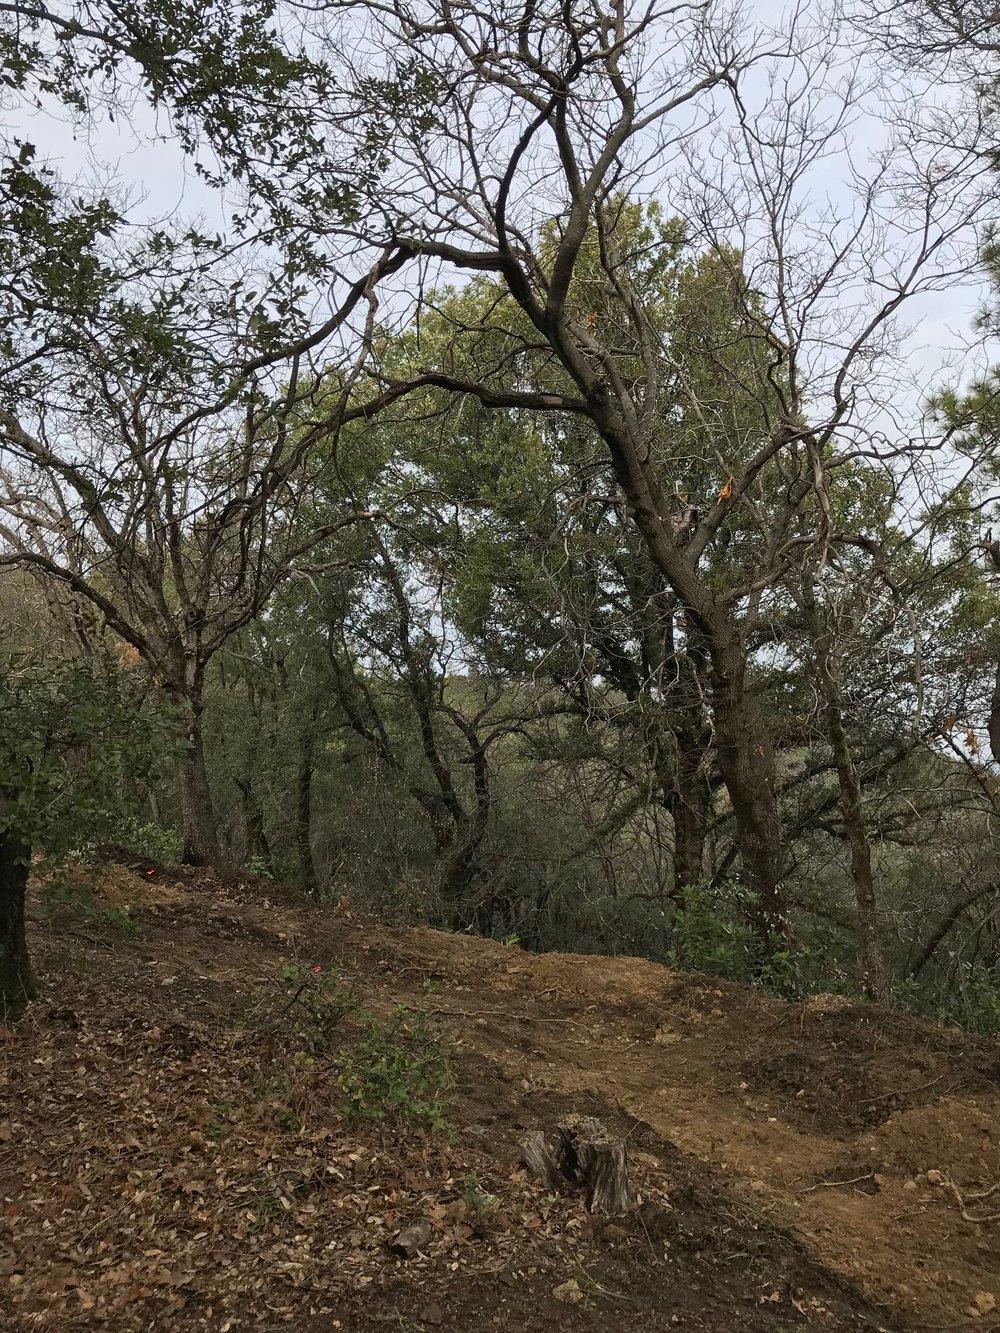 Berm mid-excavation (uphill)